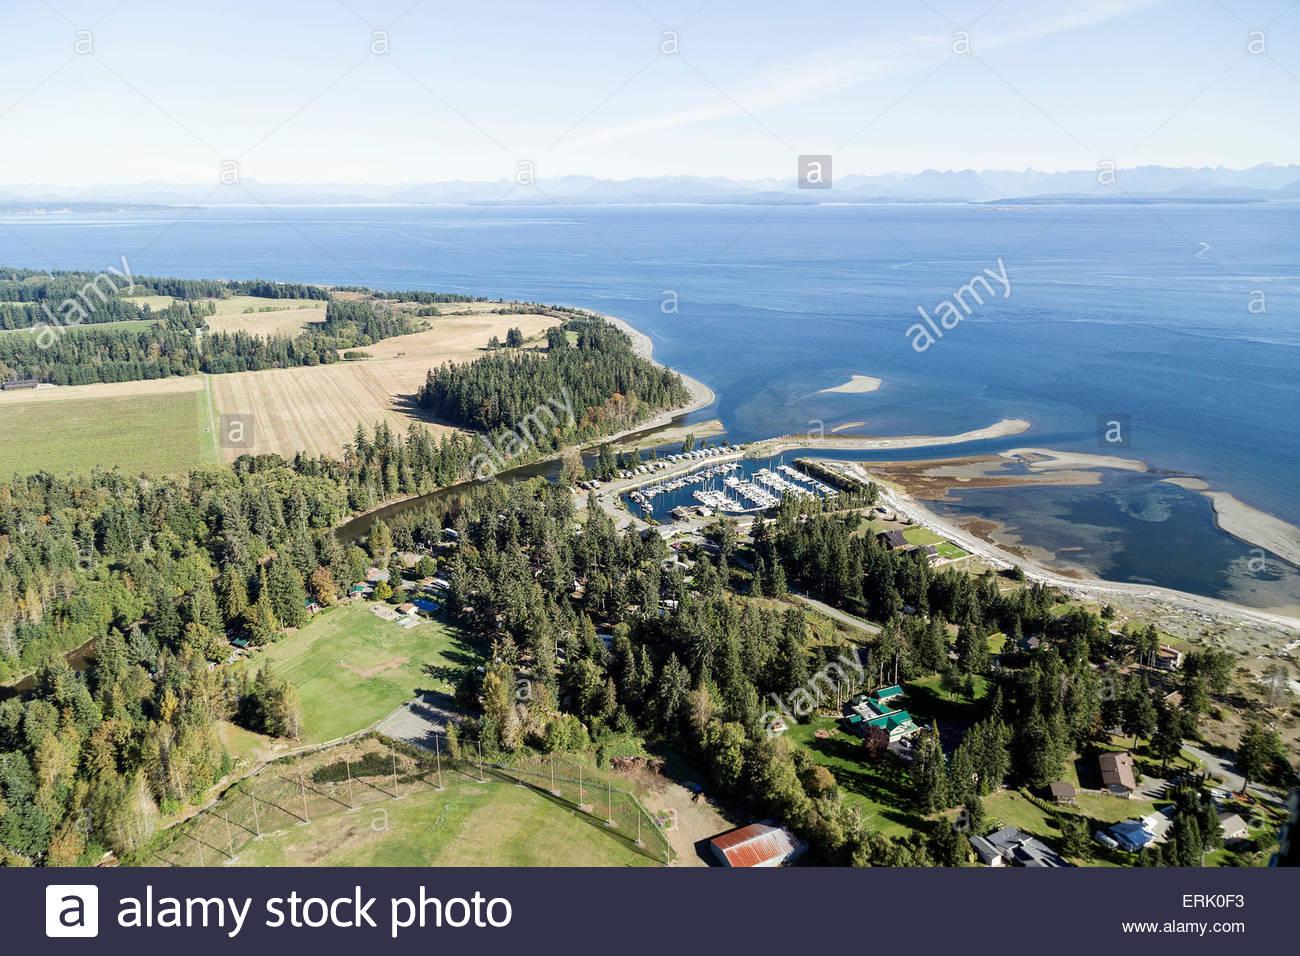 Saratoga Beach Resort; Campbell River, Vancouver Island, British Columbia,  Canada